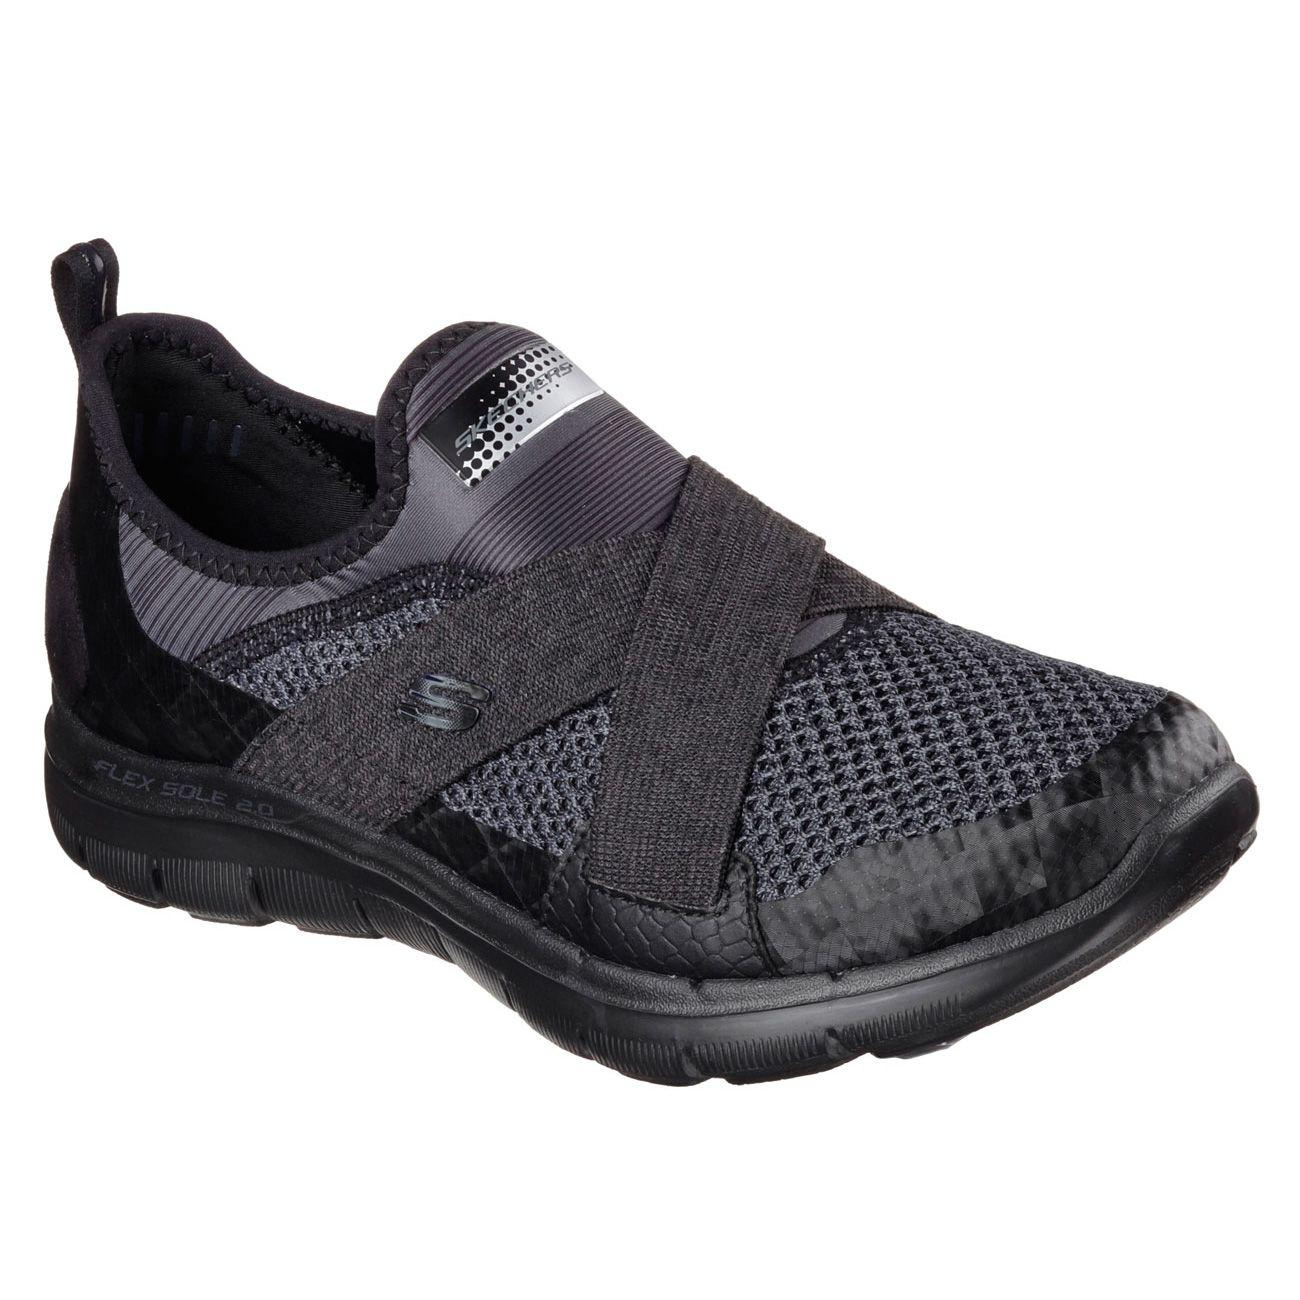 Skechers Black Velcro Shoes